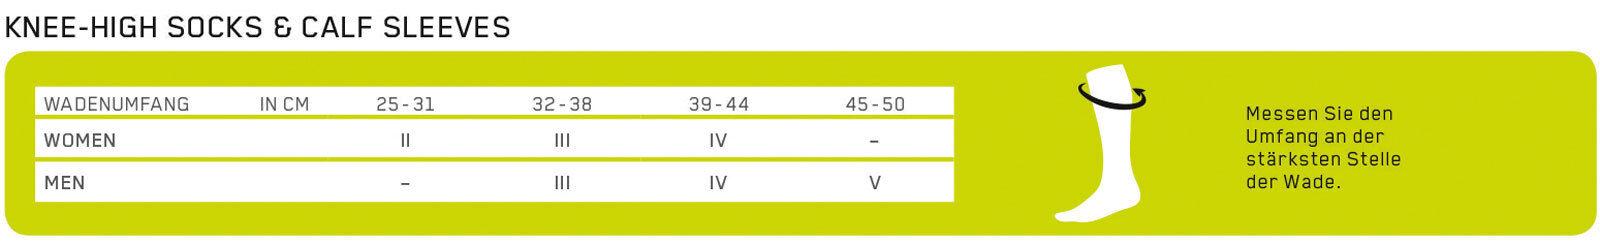 CEP Compression Calf Calf Calf Sleeves 3.0 Herren WS50X 9cc25f